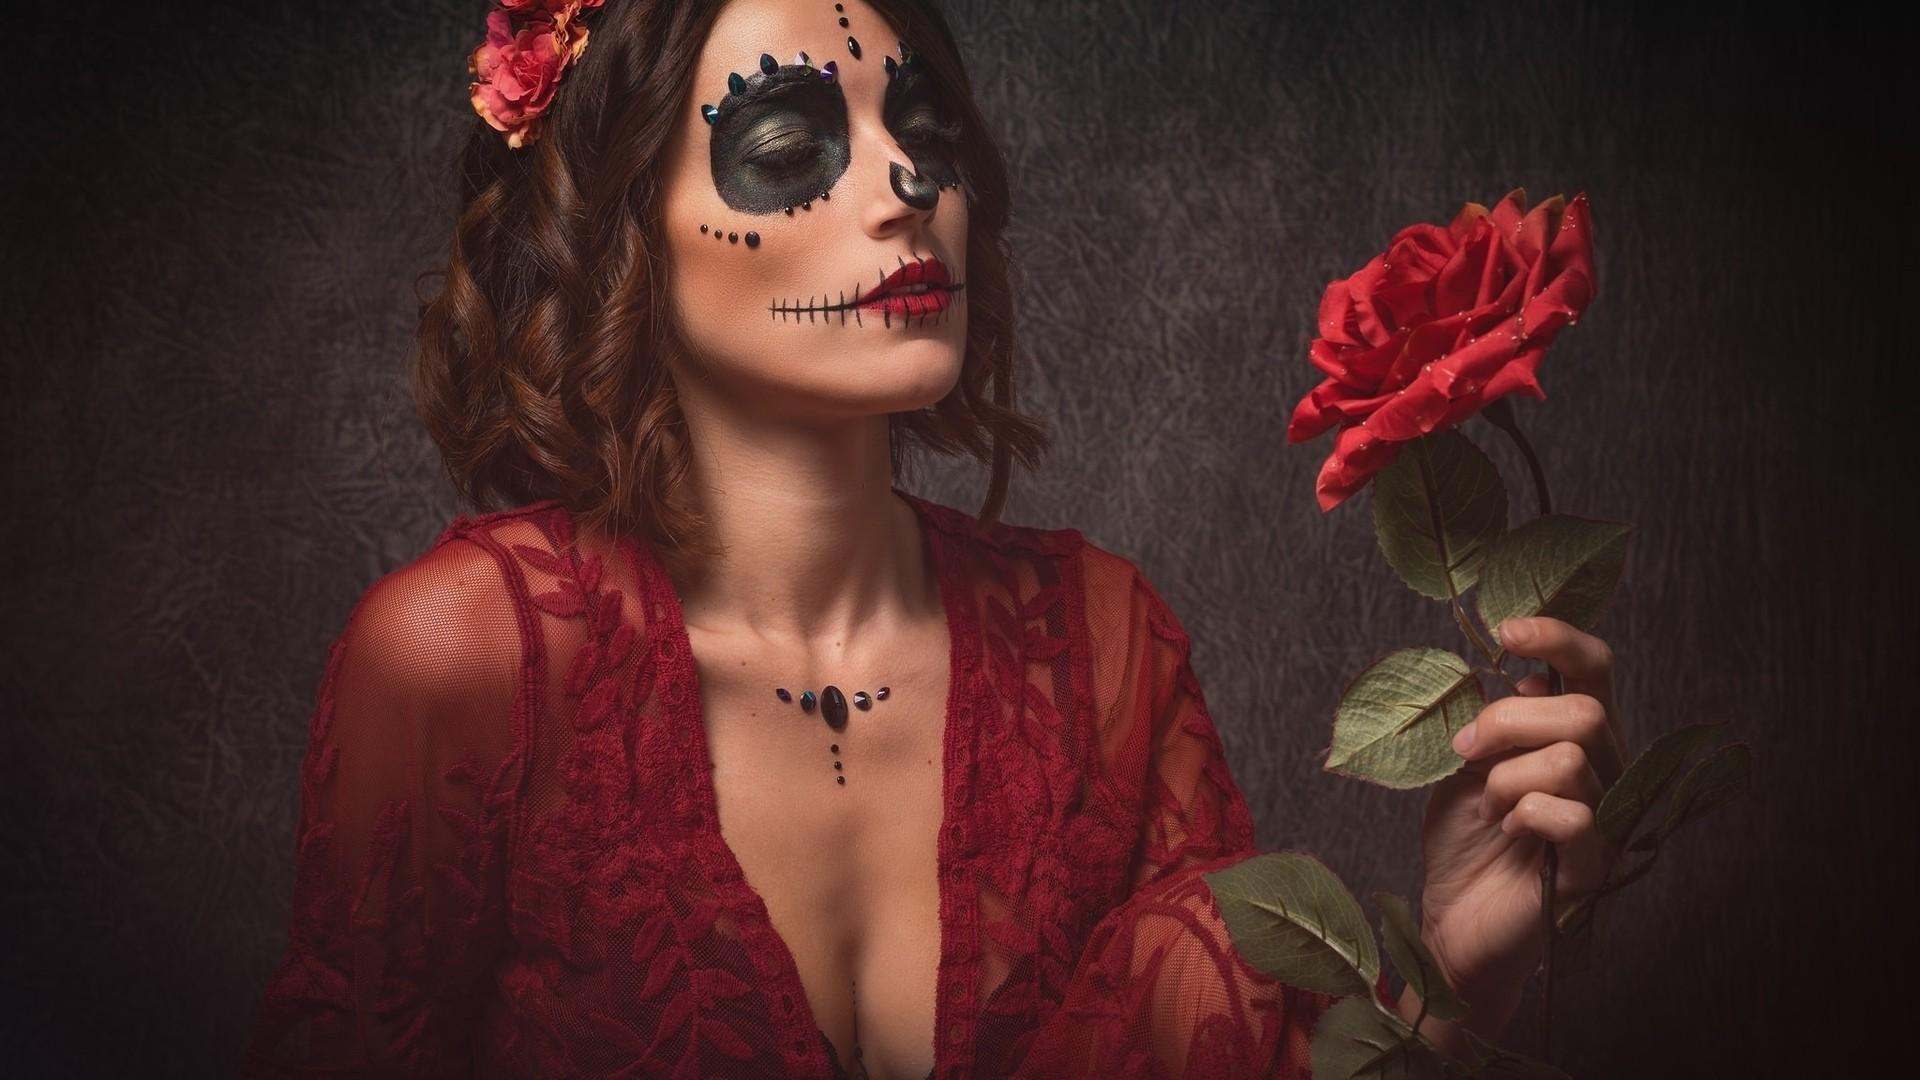 Dead Rose Picture